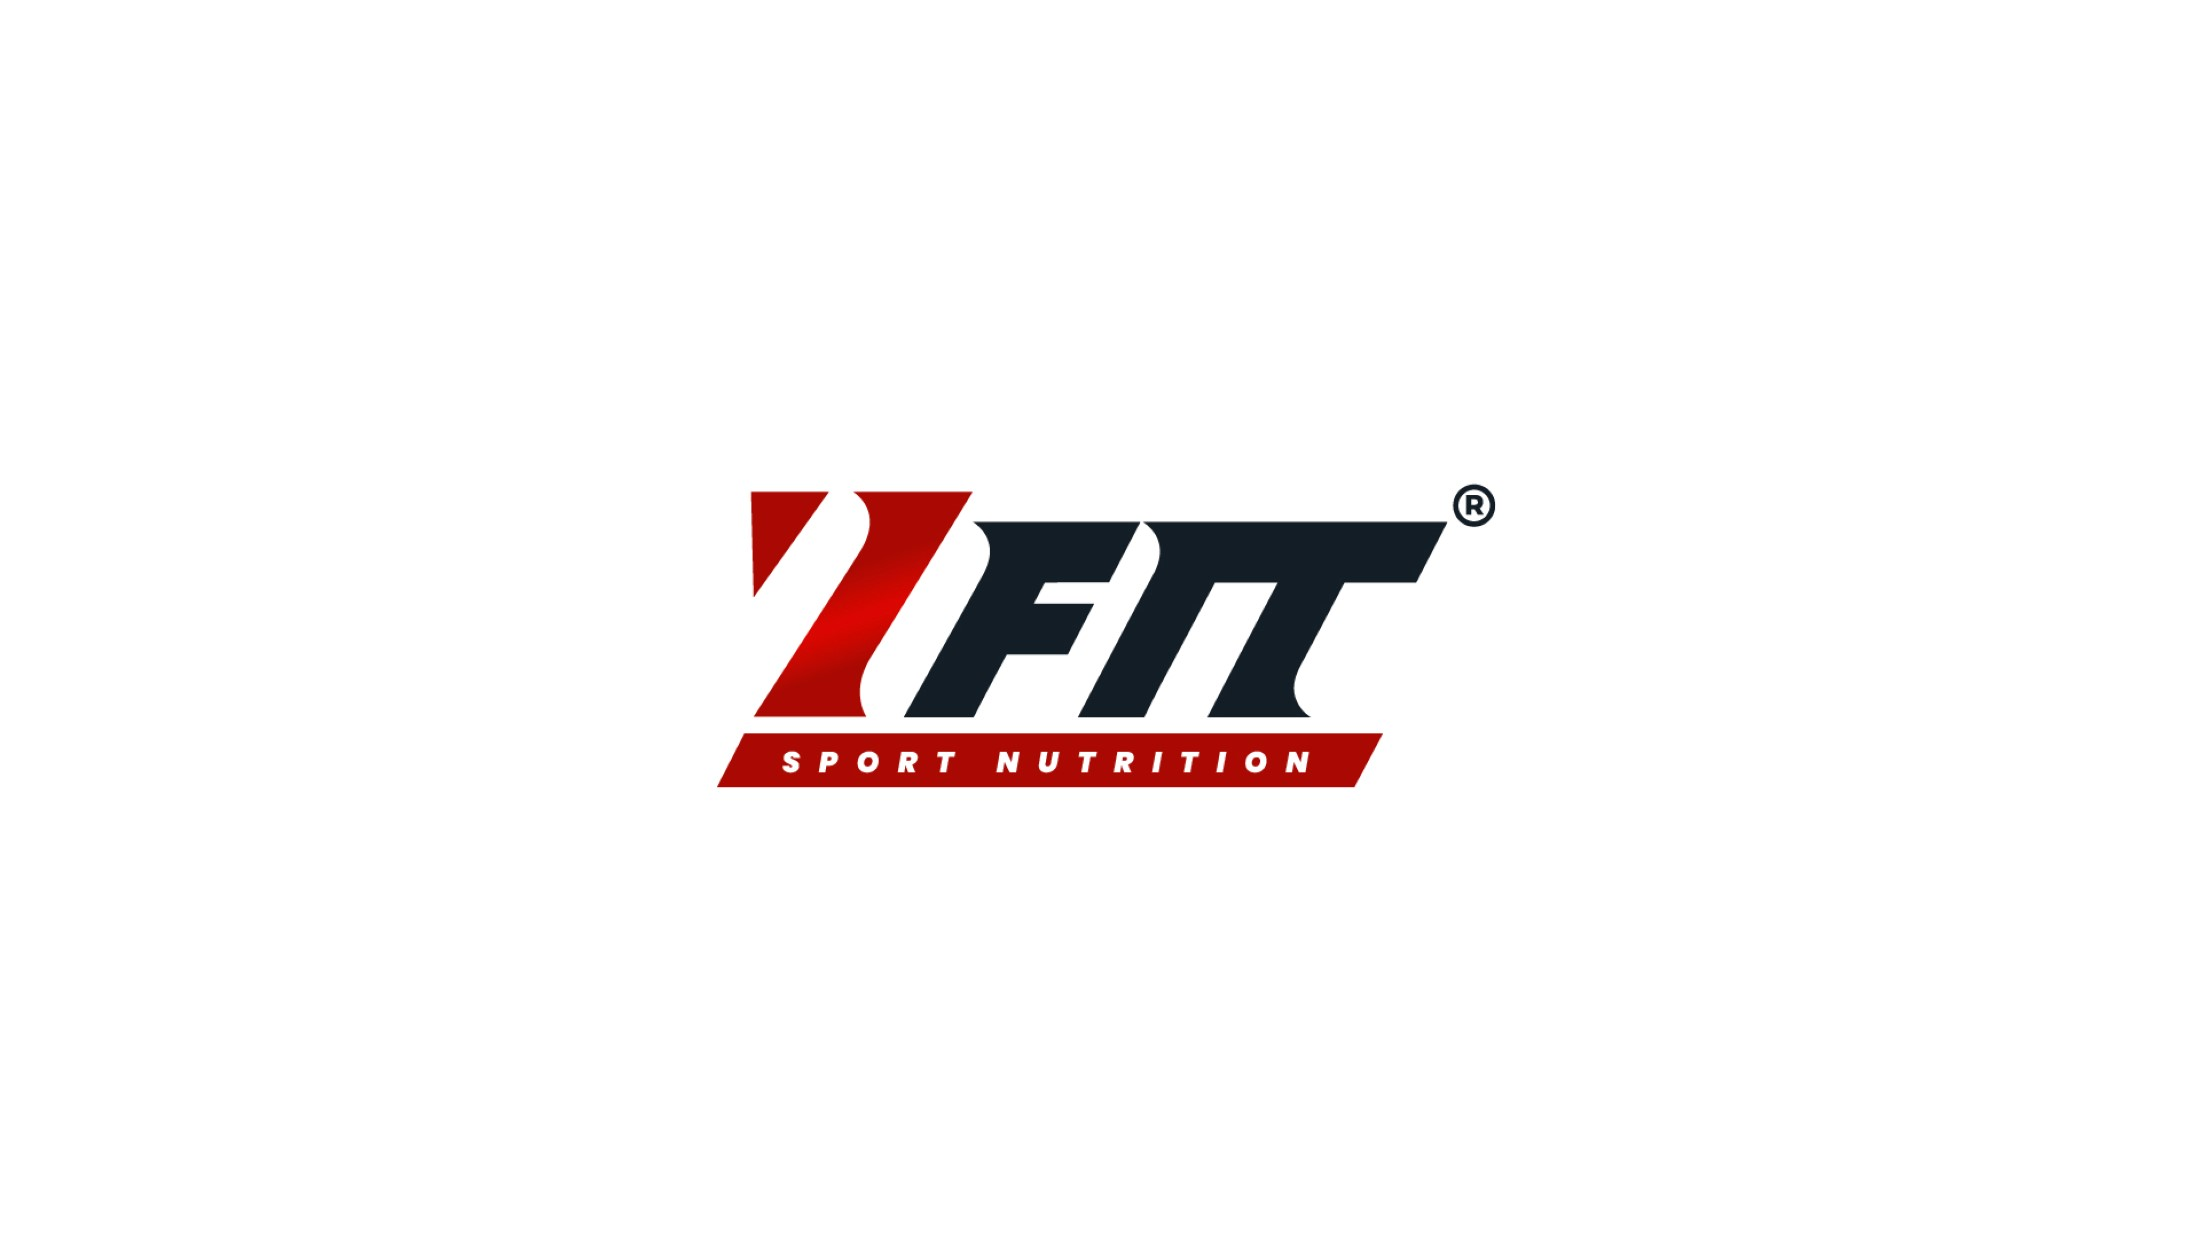 7fit_logo_bíle_pozadi-100